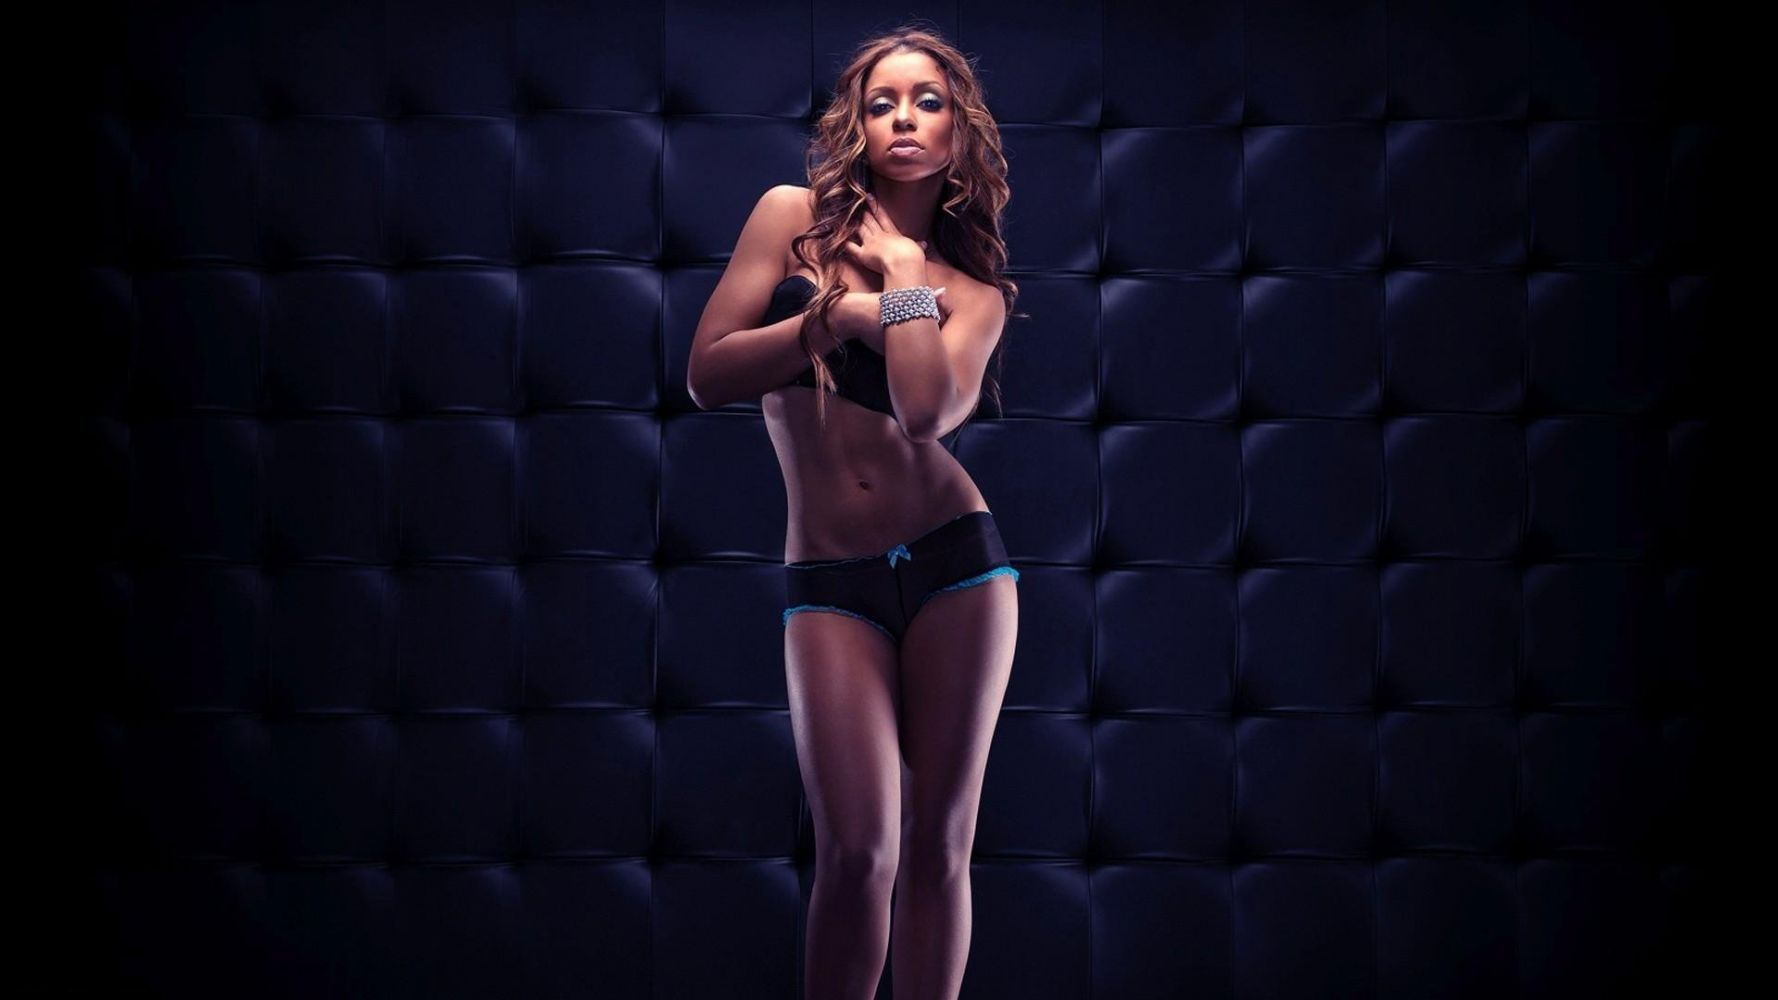 black-stripper-girls-girls-weeping-during-sex-gp-video